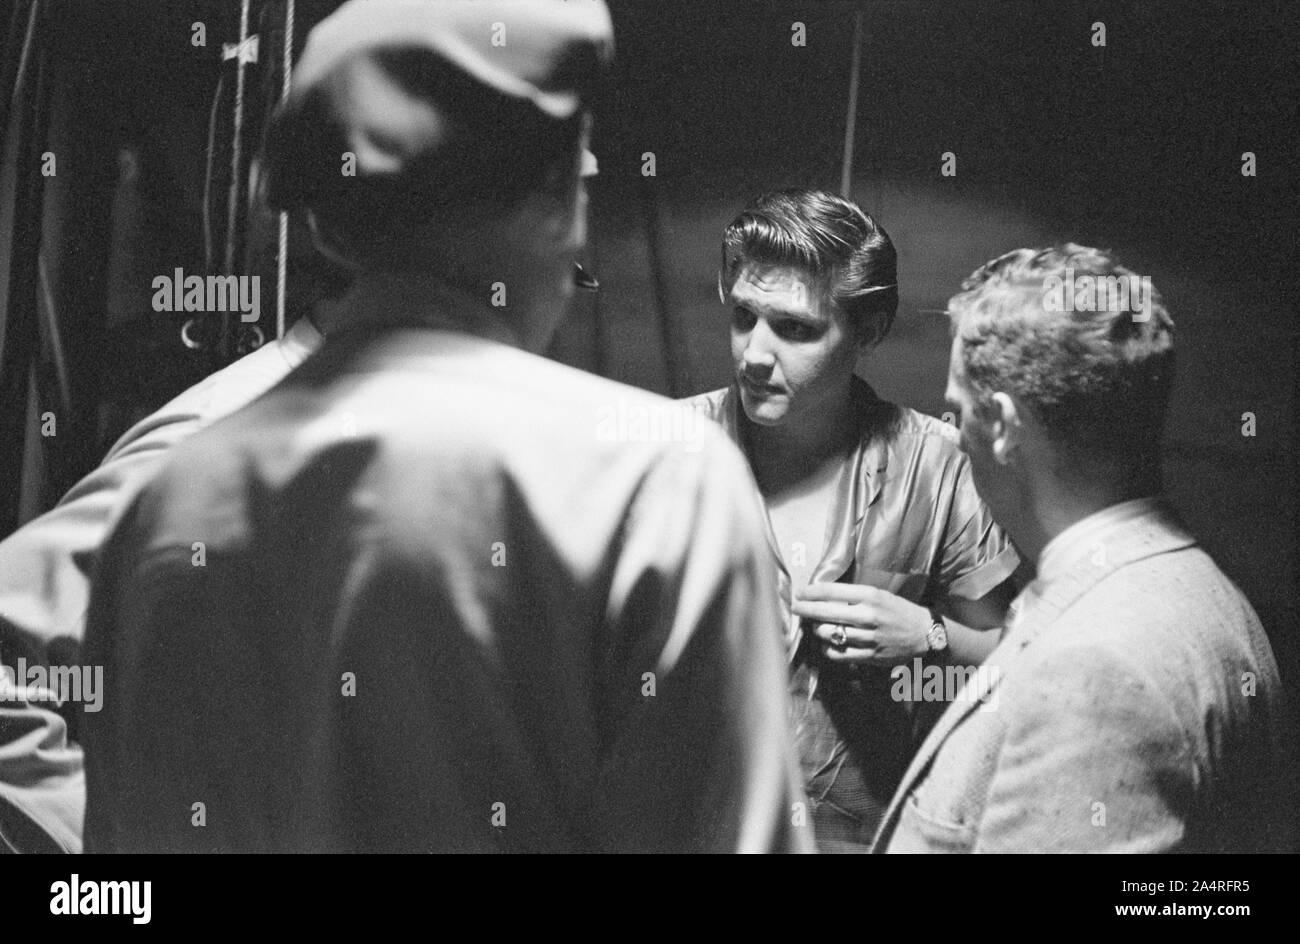 1956 ELVIS PRESLEY Dayton Ohio PHOTO Backstage with Cousin Gene